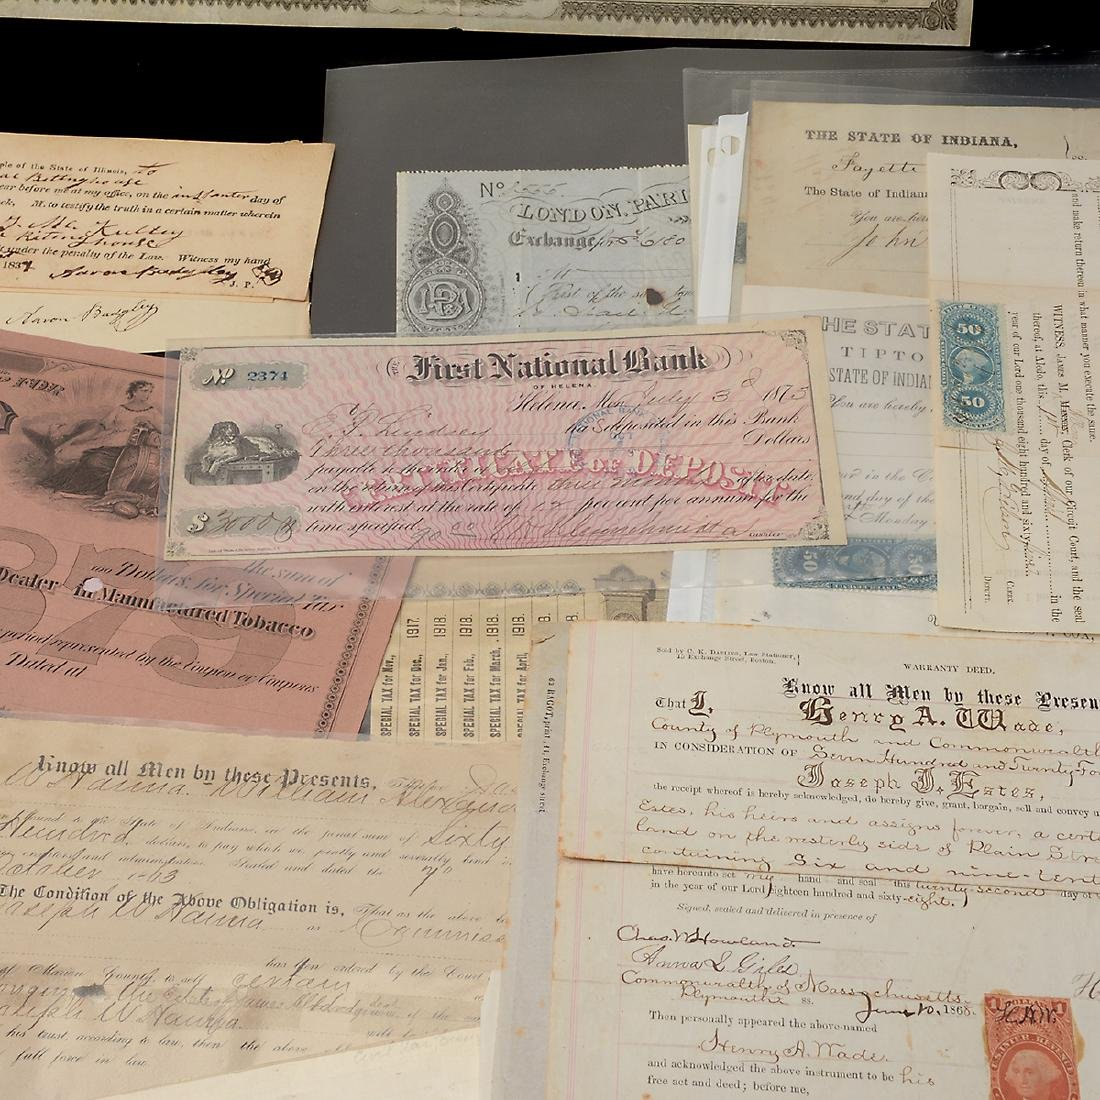 U.S Revenue Papers & Checks, 19th Century (100) - 4